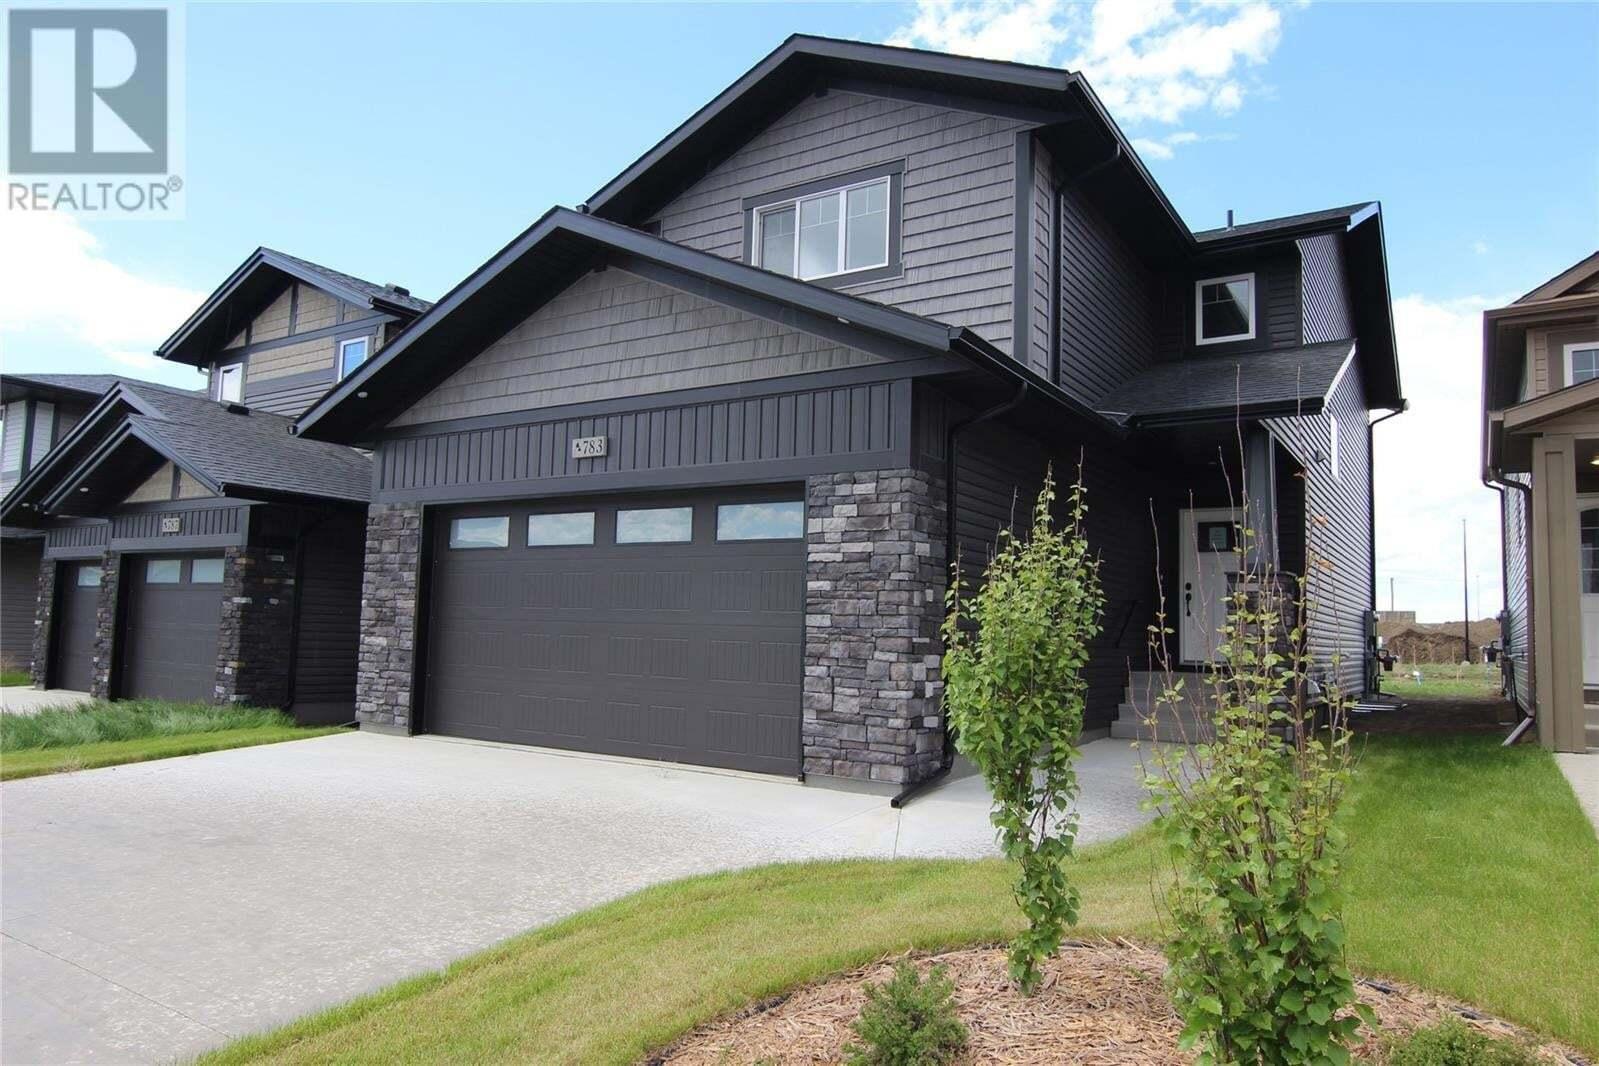 House for sale at 783 Mcfaull Ln Saskatoon Saskatchewan - MLS: SK826835